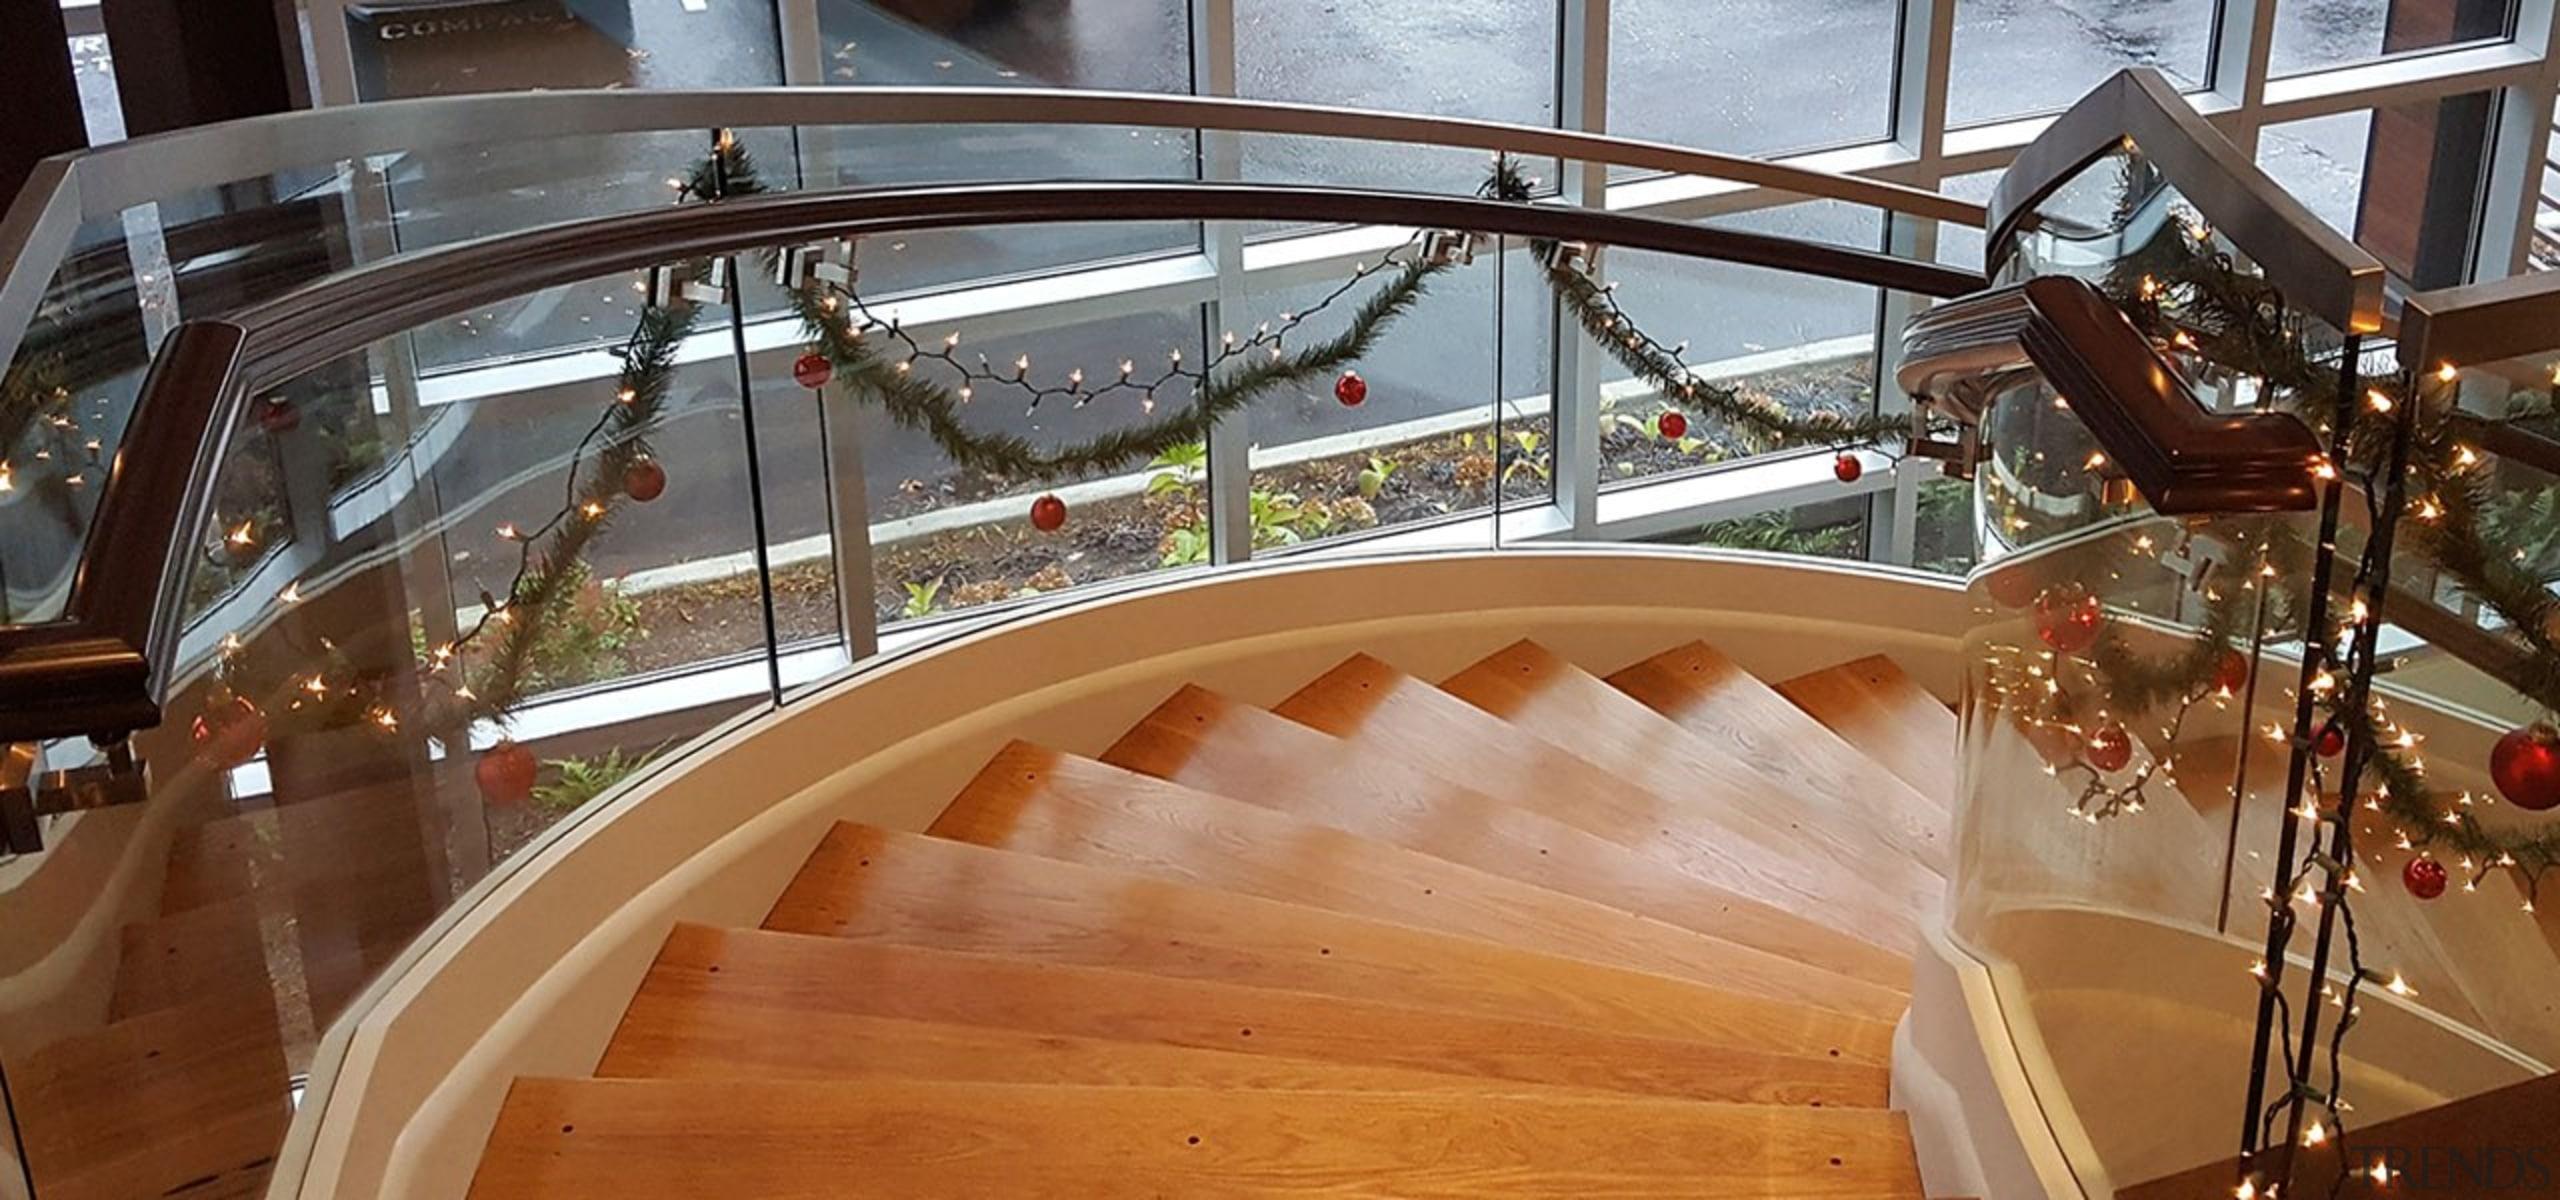 Aegis Living 02 - architecture   deck   architecture, deck, floor, handrail, hardwood, spiral, stairs, wood, wood flooring, brown, gray